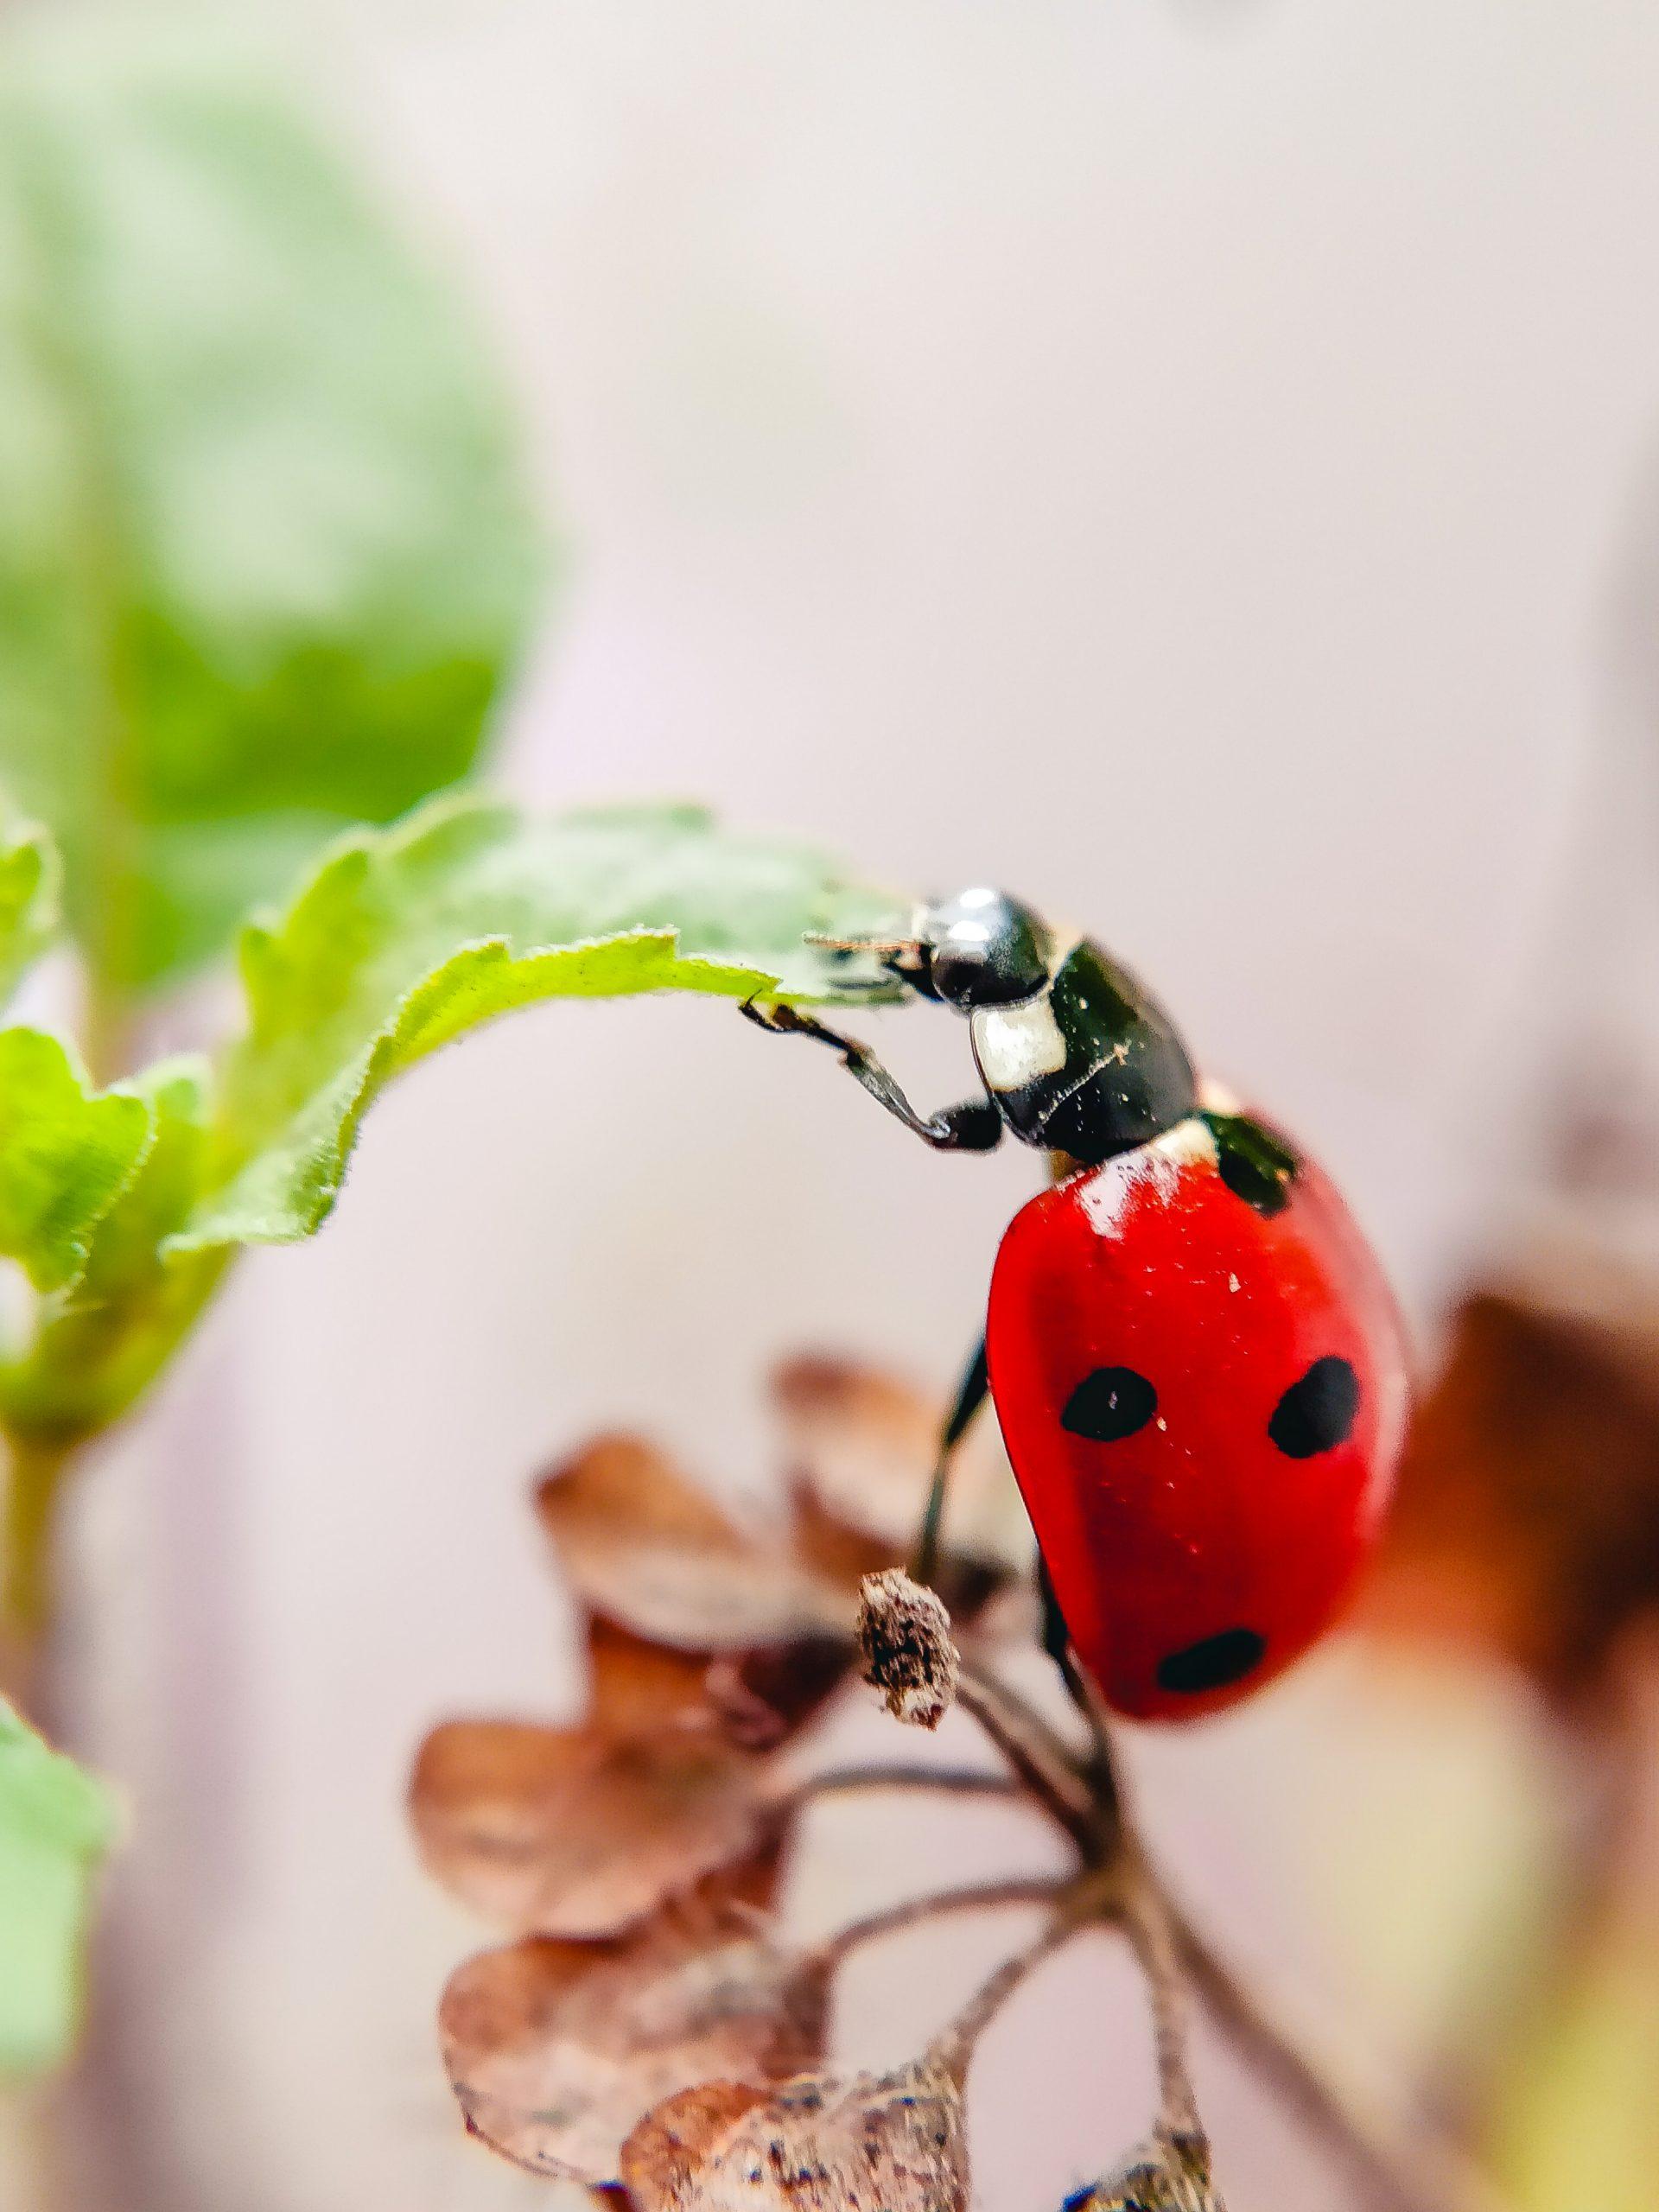 Red bug on plant leaf